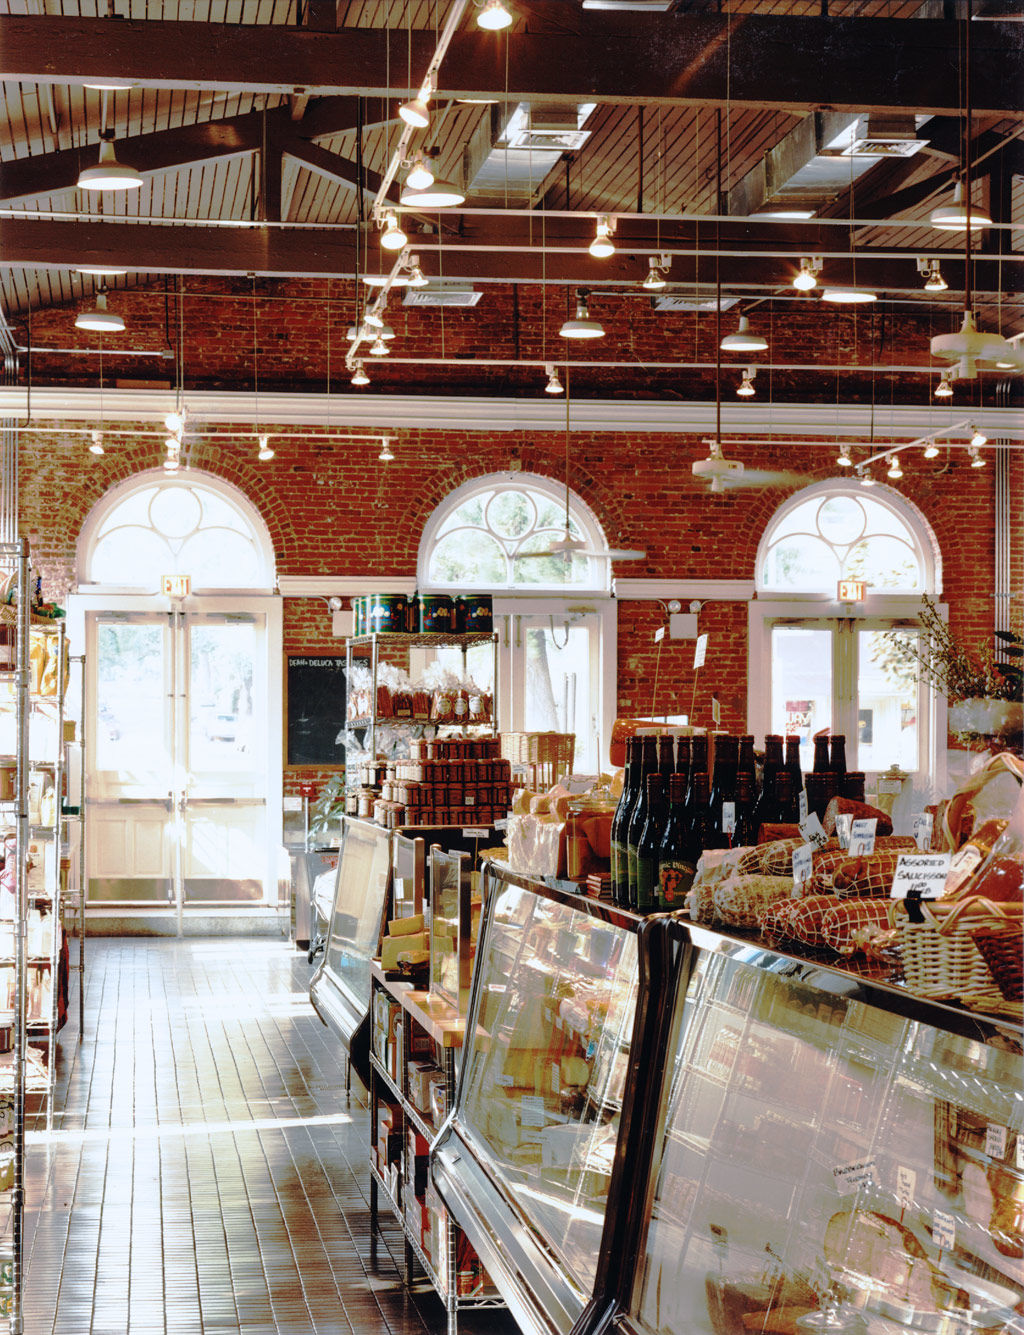 Dean & Deluca Markethouse by CORE architecture + design